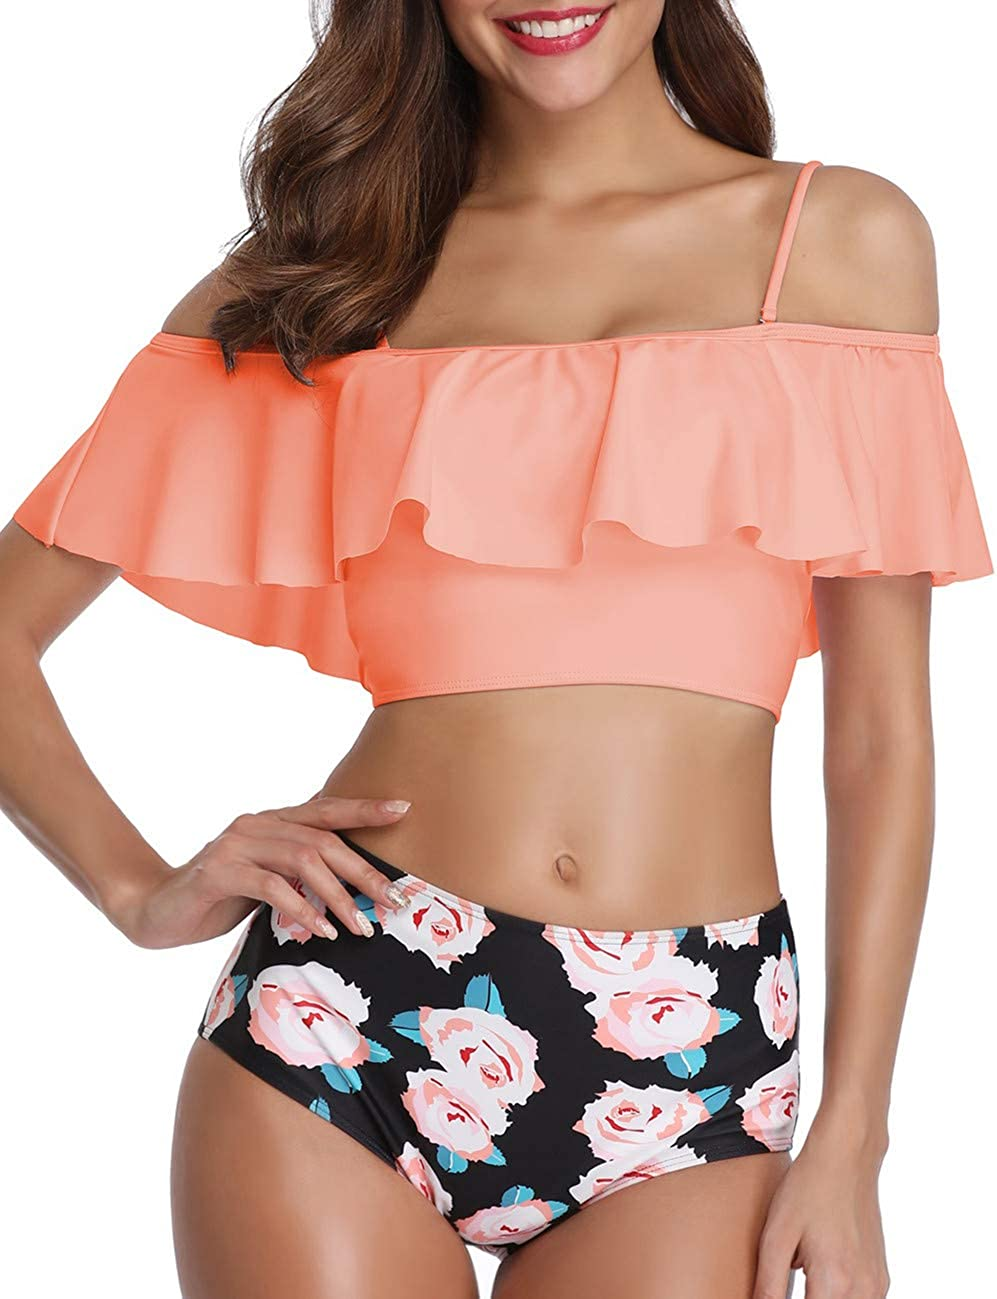 Mycoco Women's High Waisted Bathing Suits Tassel Flowy Flounce Two Piece Bikini Swimsuits